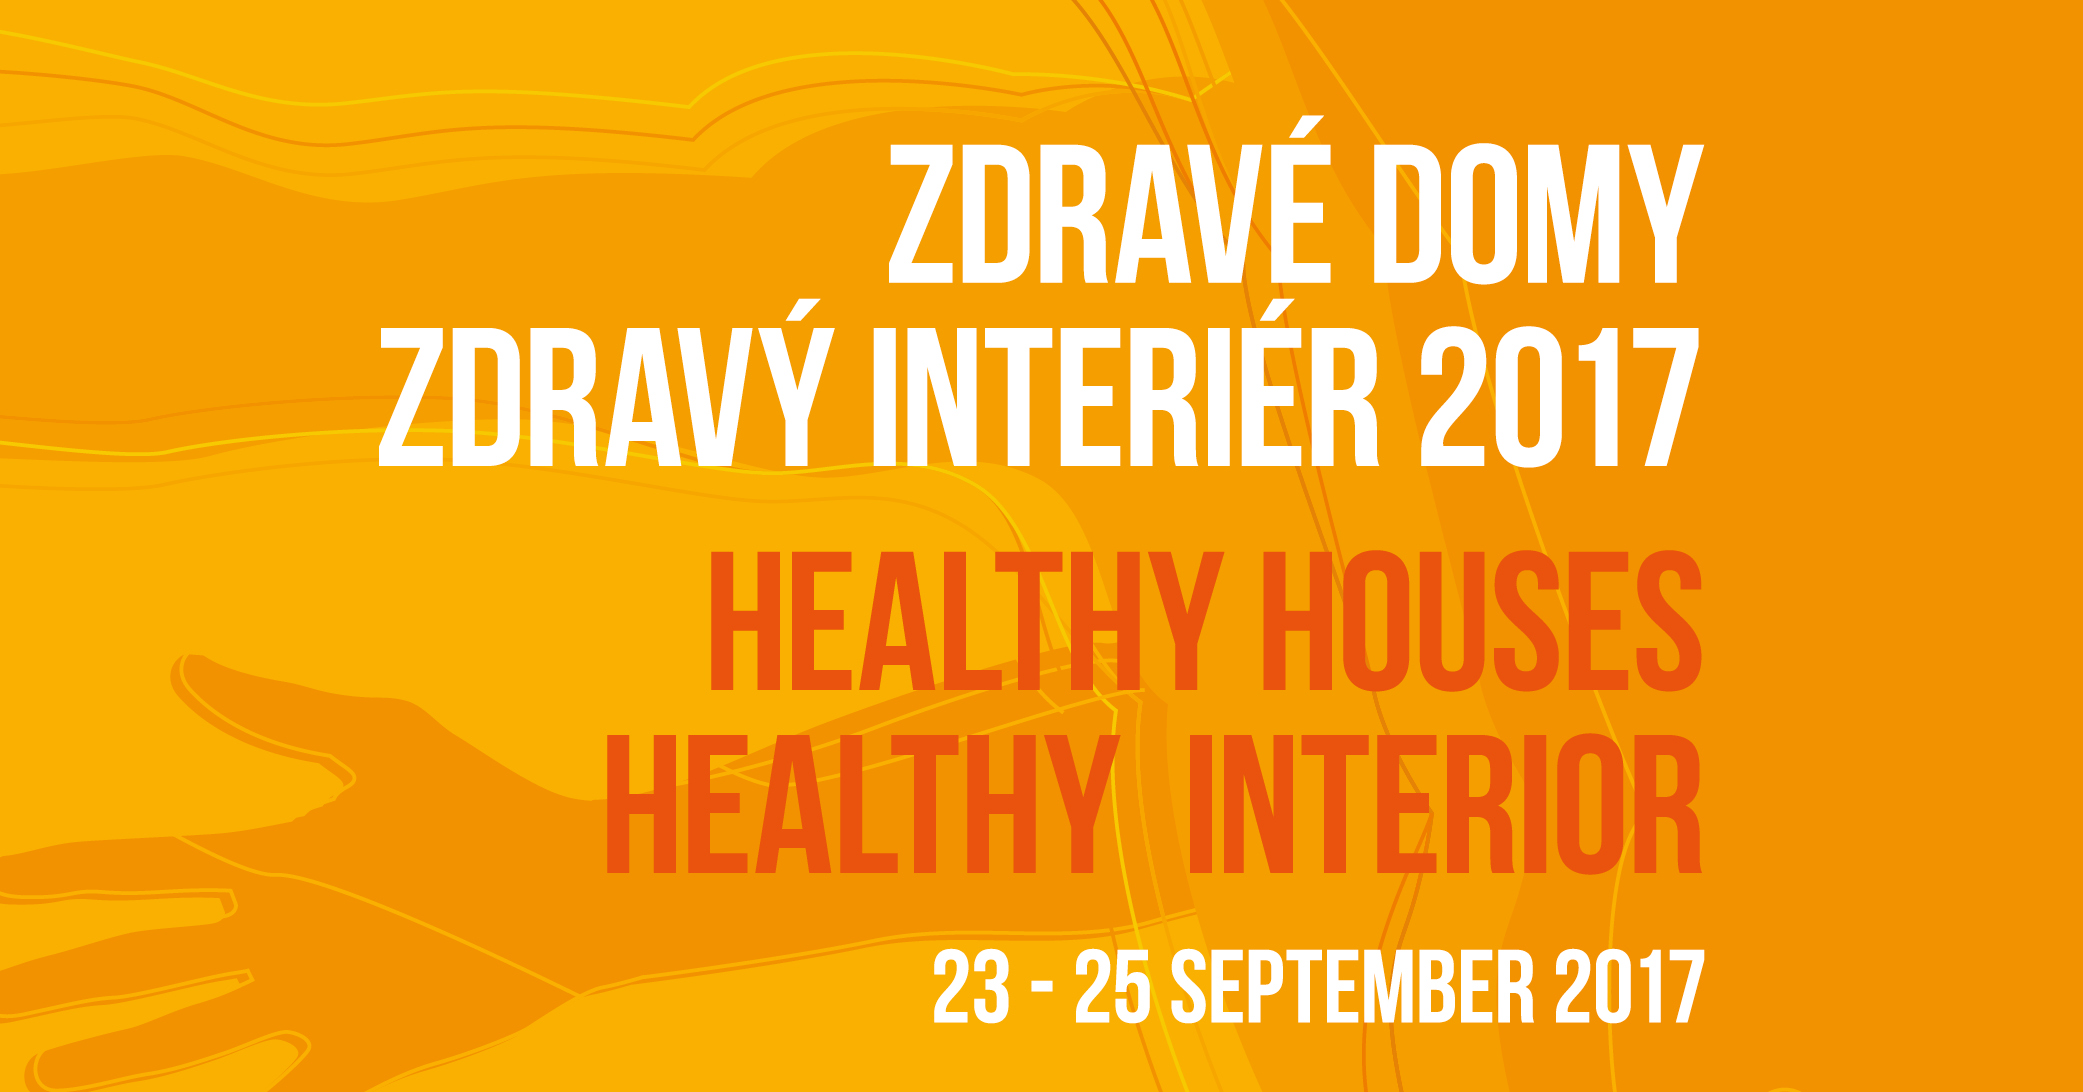 event_fb_zdrave_domy